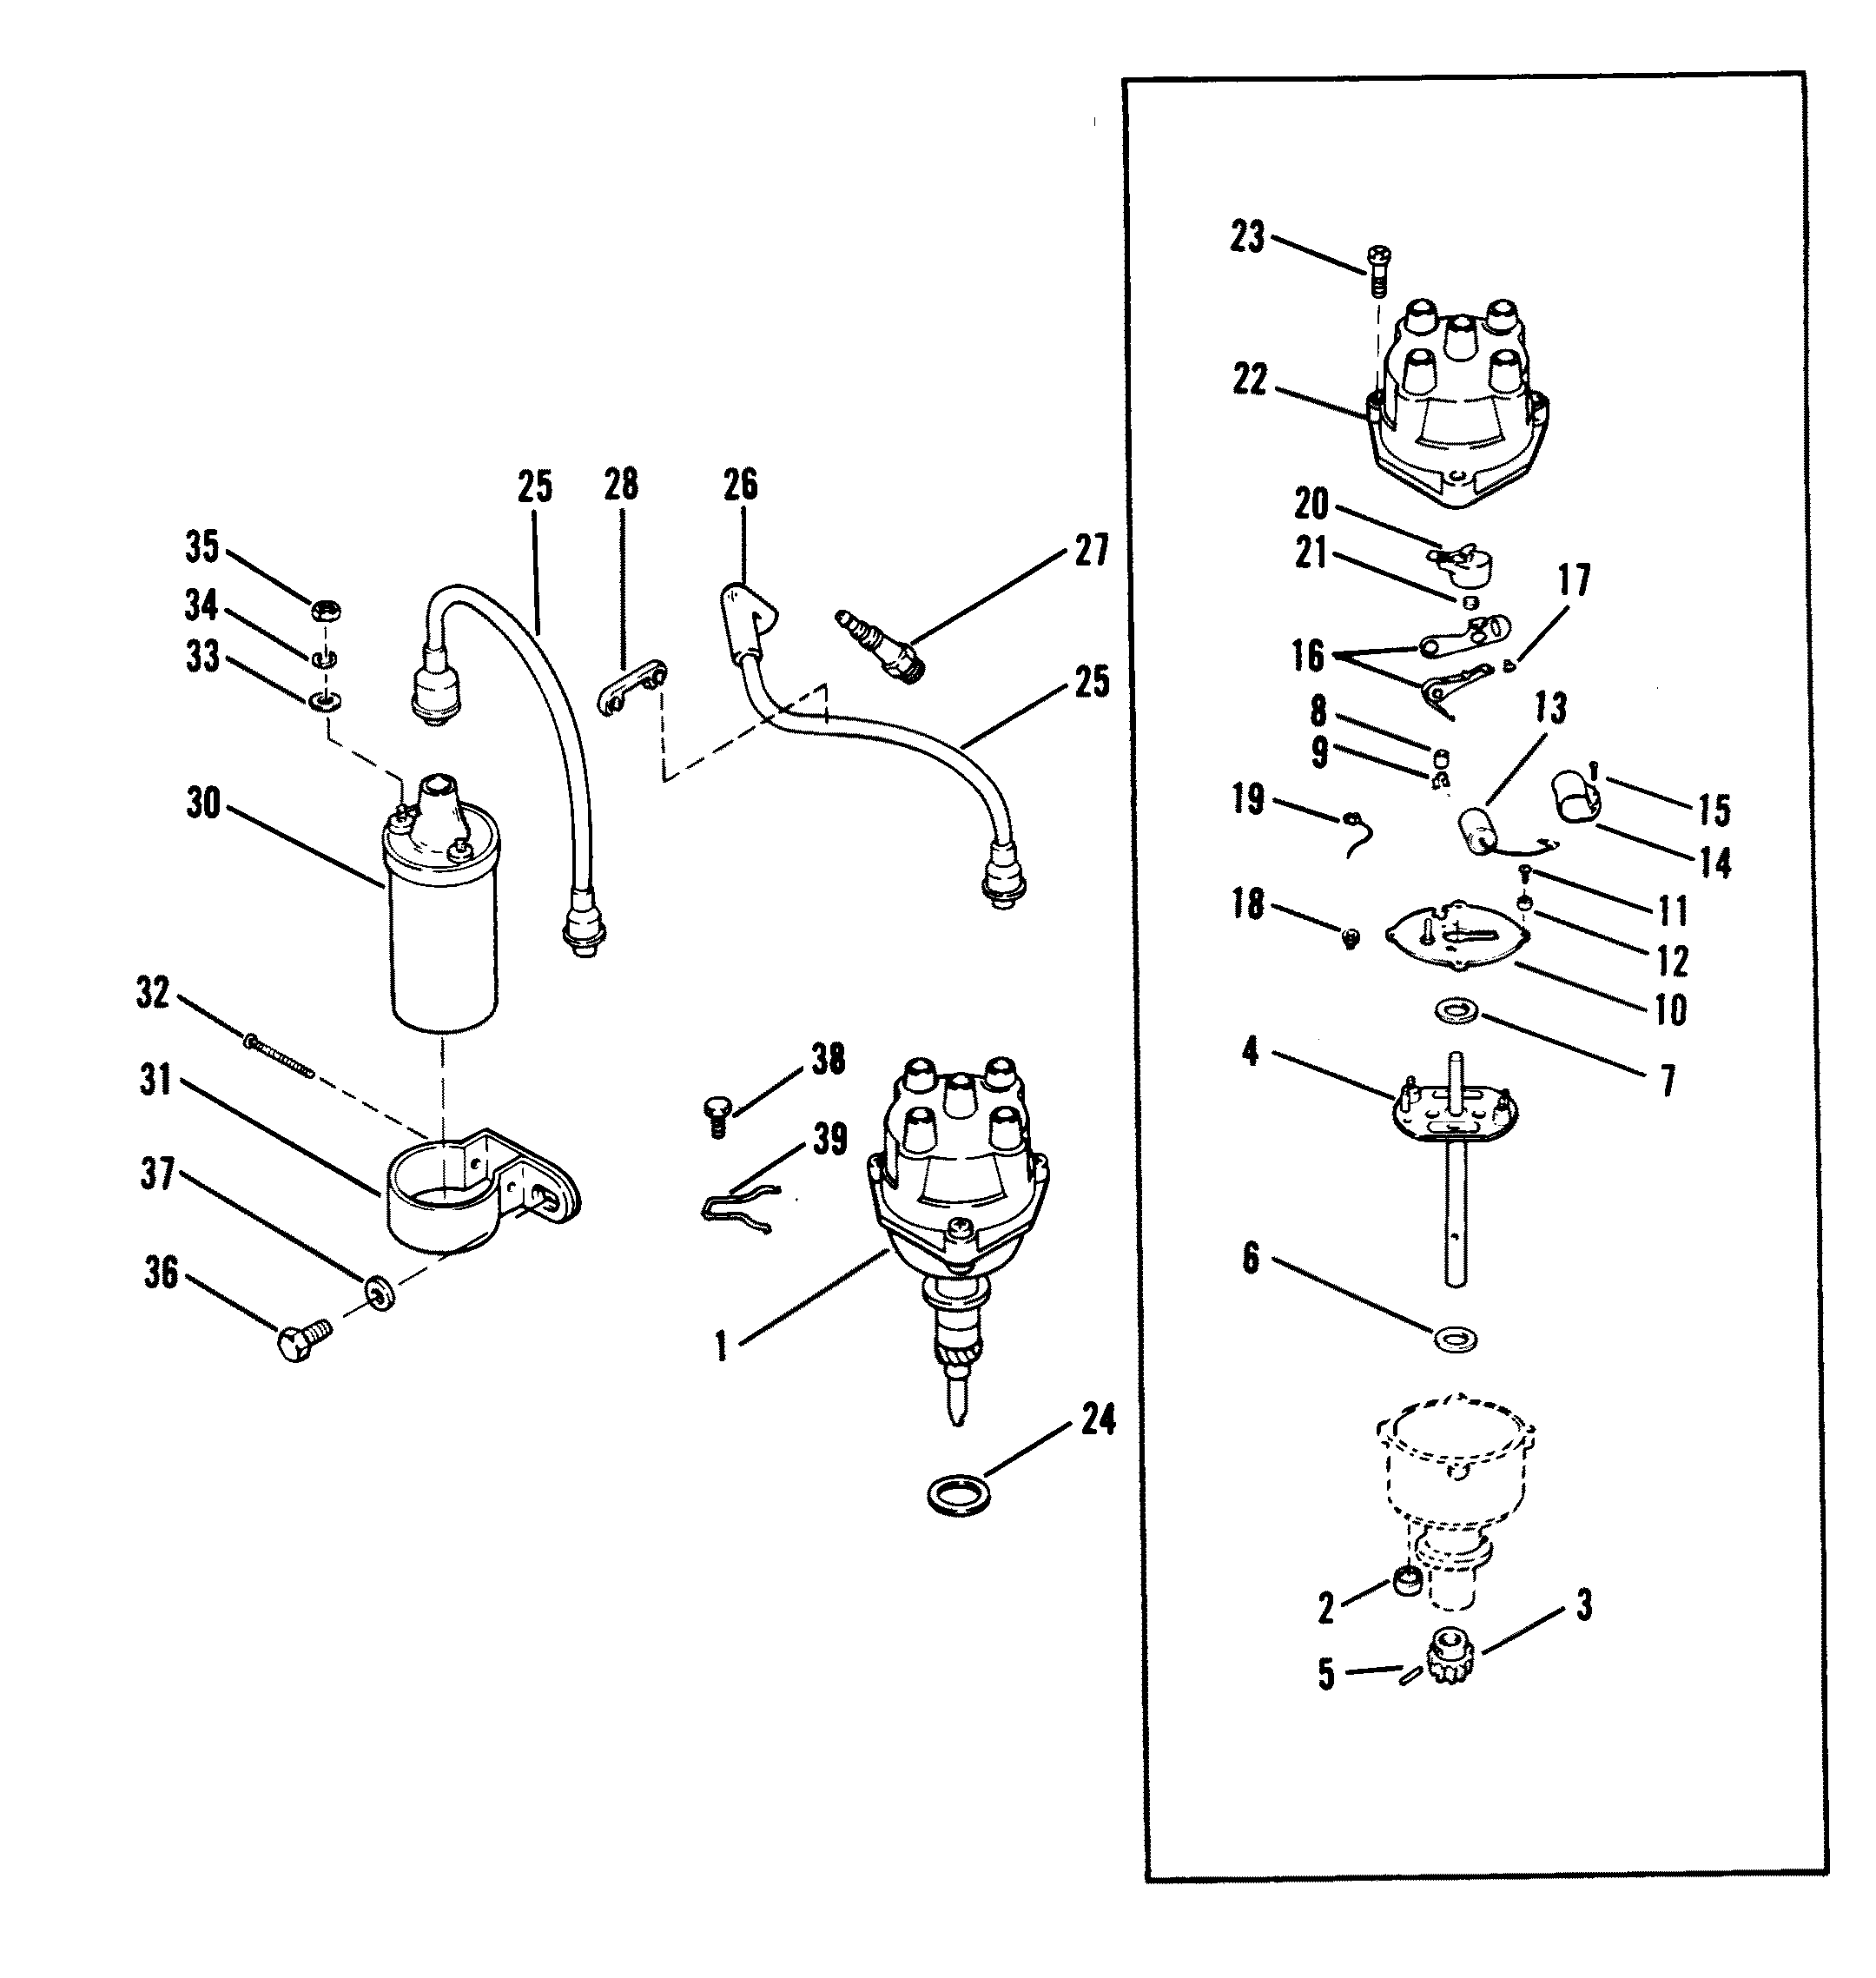 Distributor Wiring Diagram – Accel Distributor Wiring Diagram